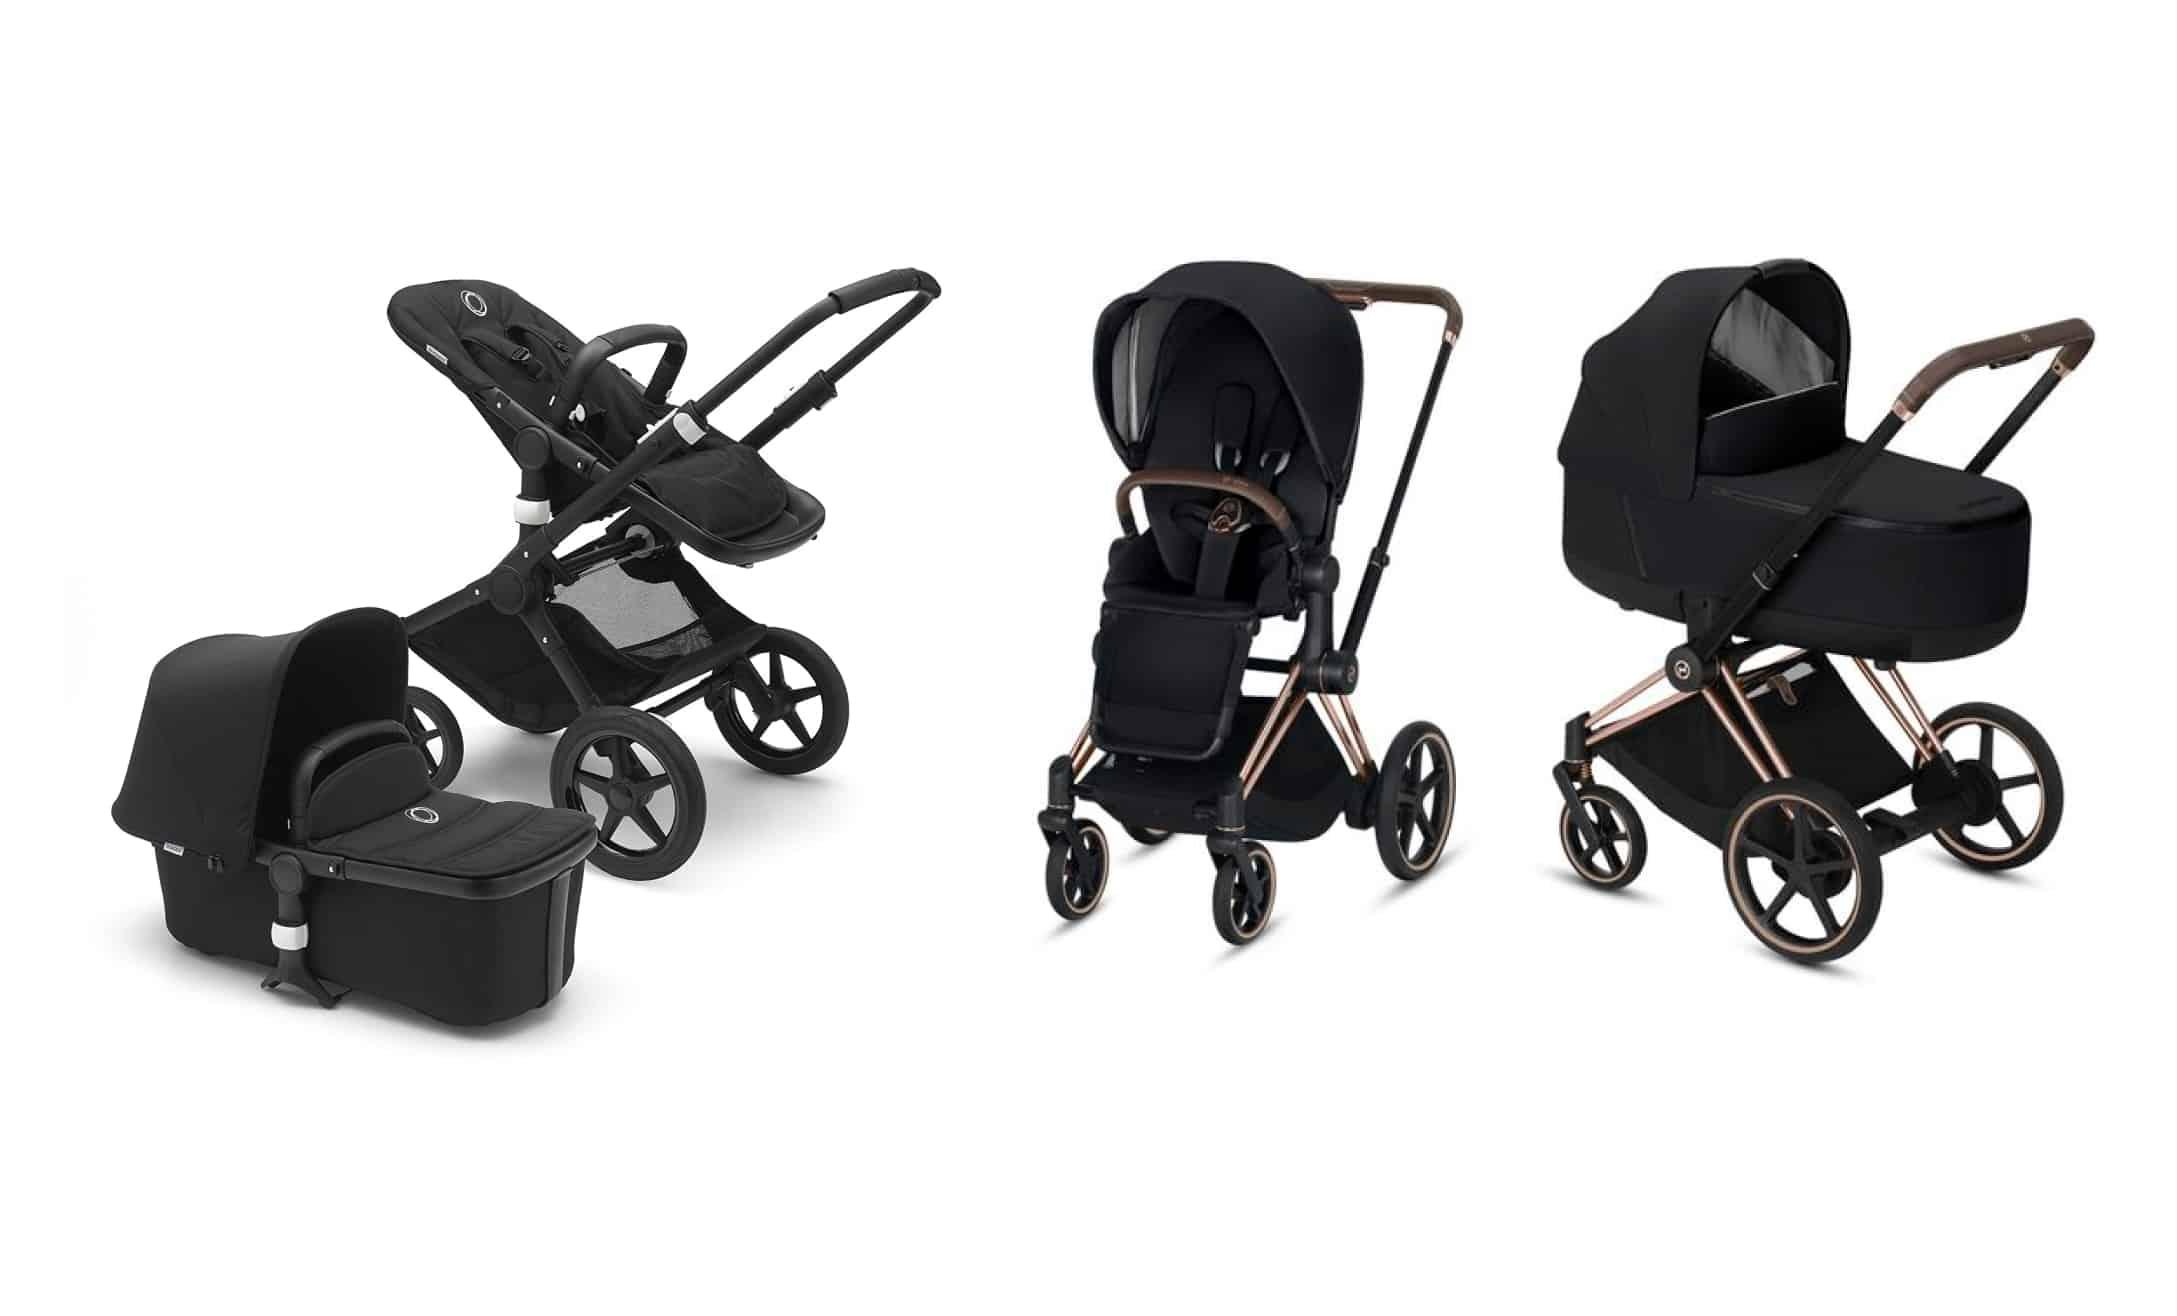 Tre olika barnvagnar